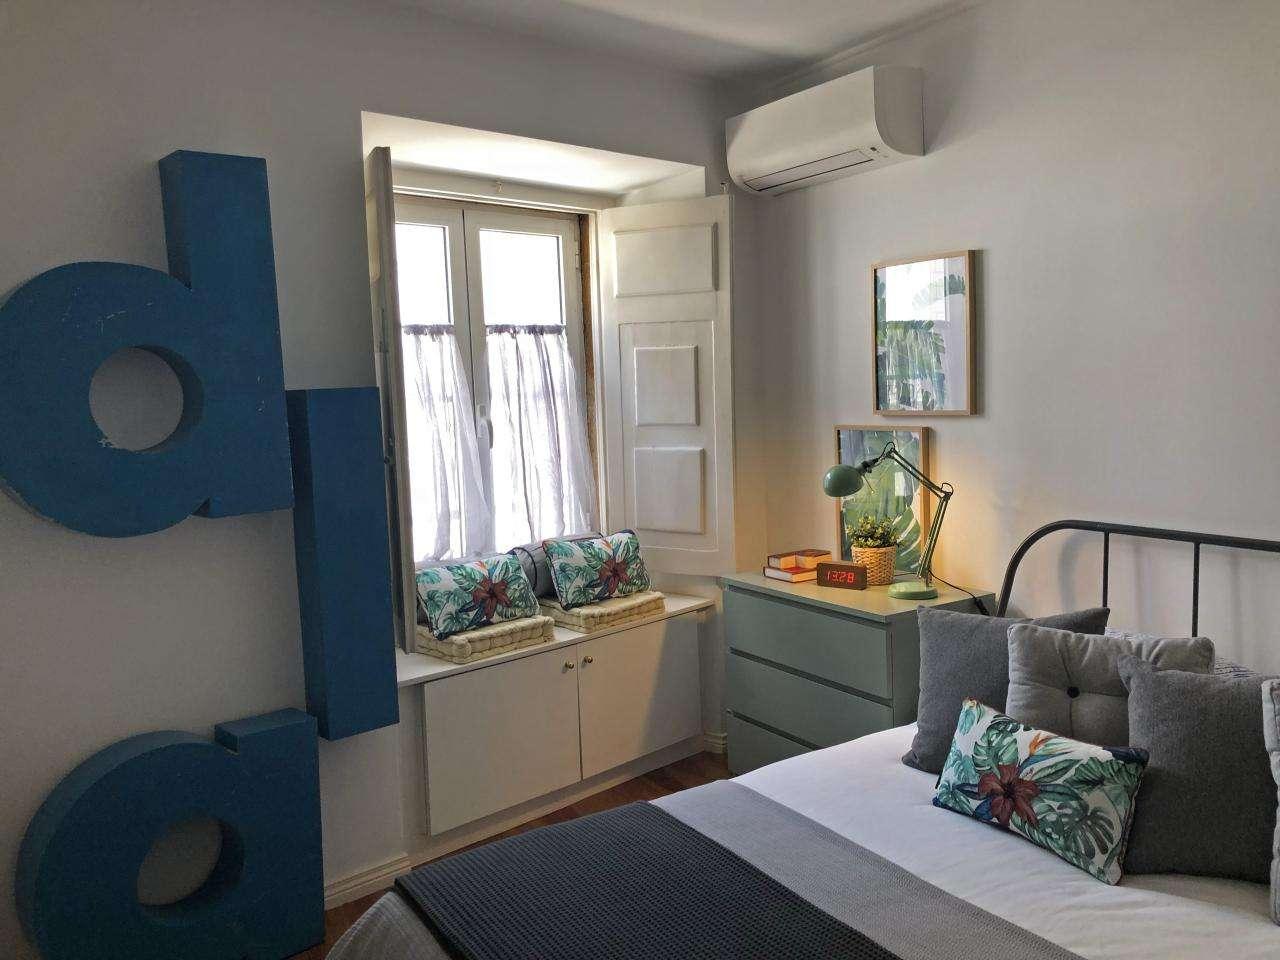 Apartamento para comprar, Misericórdia, Lisboa - Foto 27